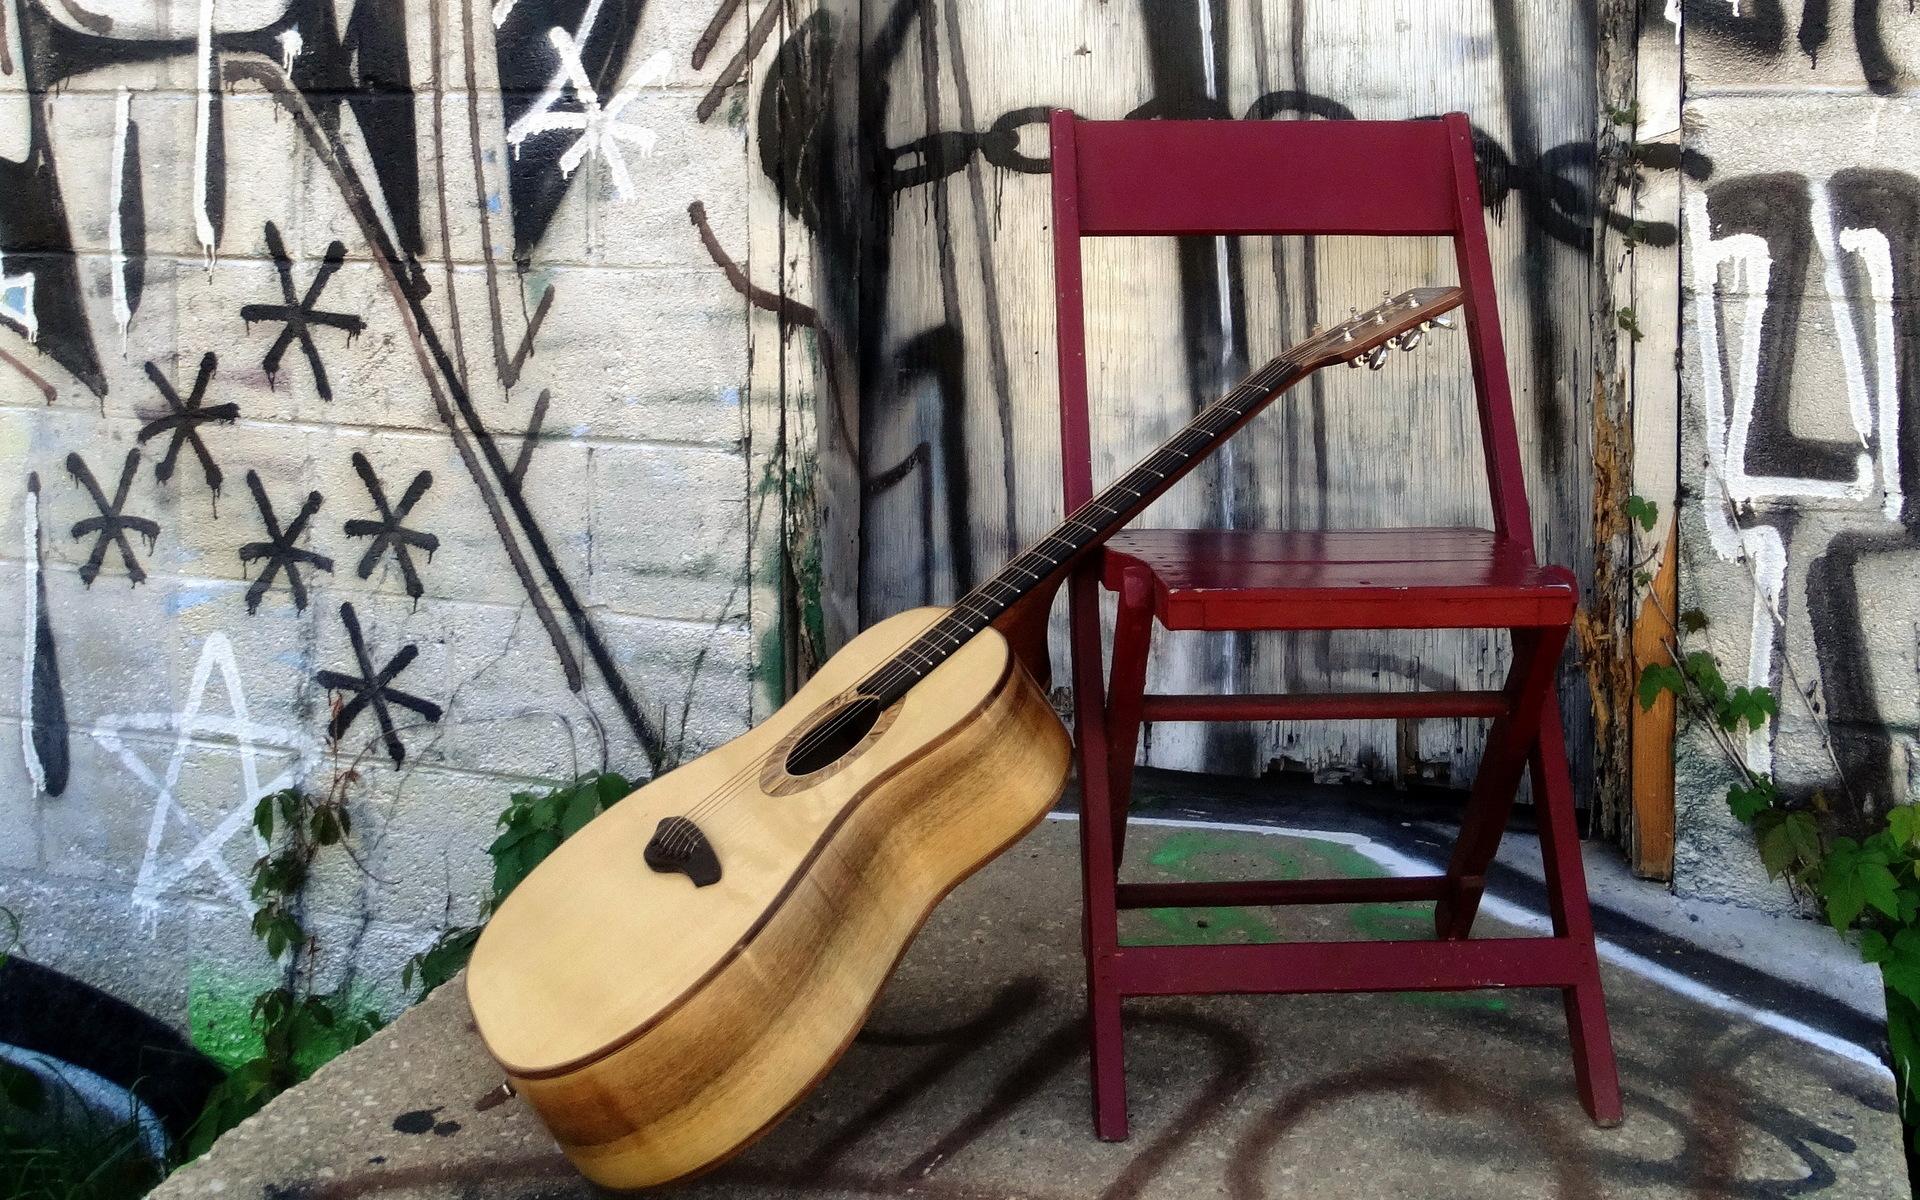 Image: Guitar, chair, drawing, graffiti